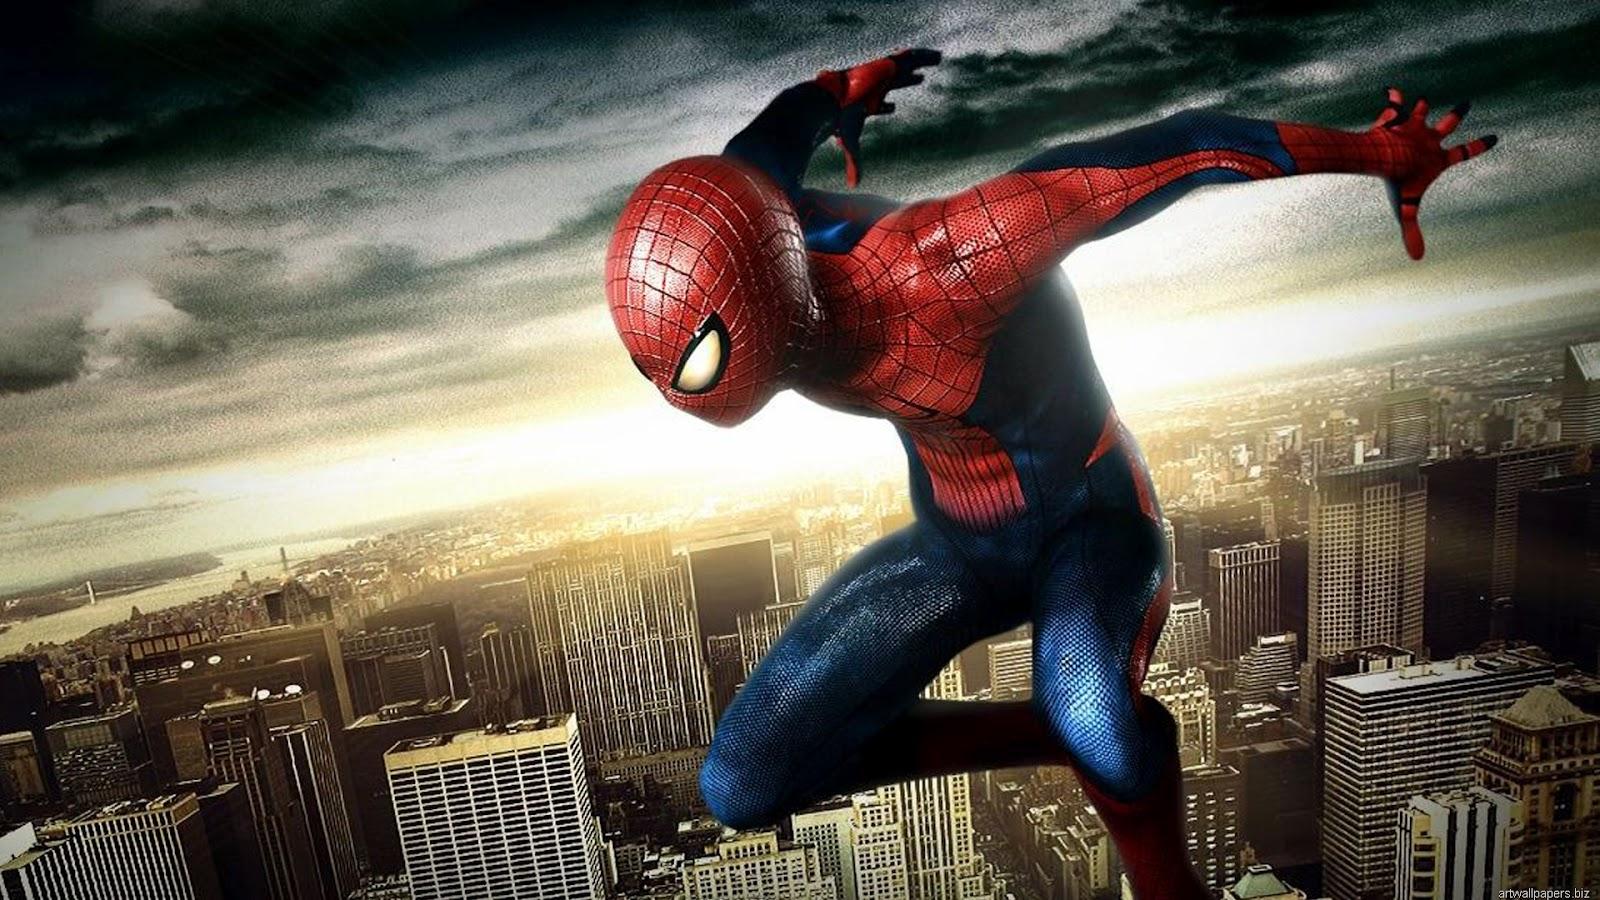 http://2.bp.blogspot.com/-ei5R_kJXem8/T8GCgk-OUOI/AAAAAAAAAQM/aSdJdLzBzDA/s1600/The+Amazing+Spider-Man+(2012)+Wallpaper.jpg